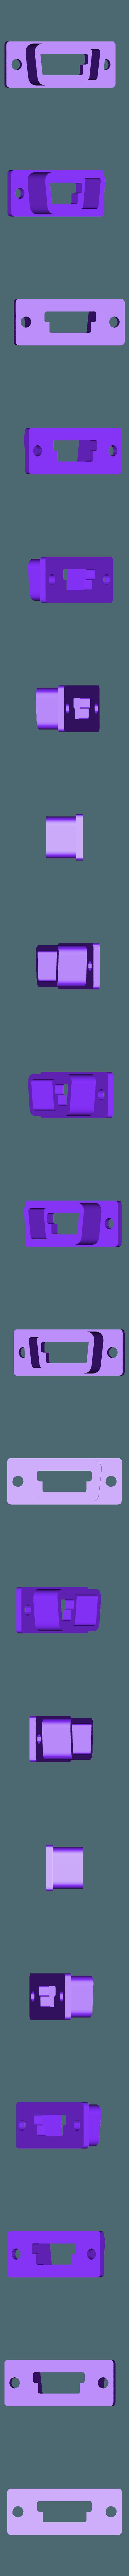 "db9male-standard.stl Download free SCAD file DB9 male socket (just add 0.1"" header) • 3D printable template, arpruss"